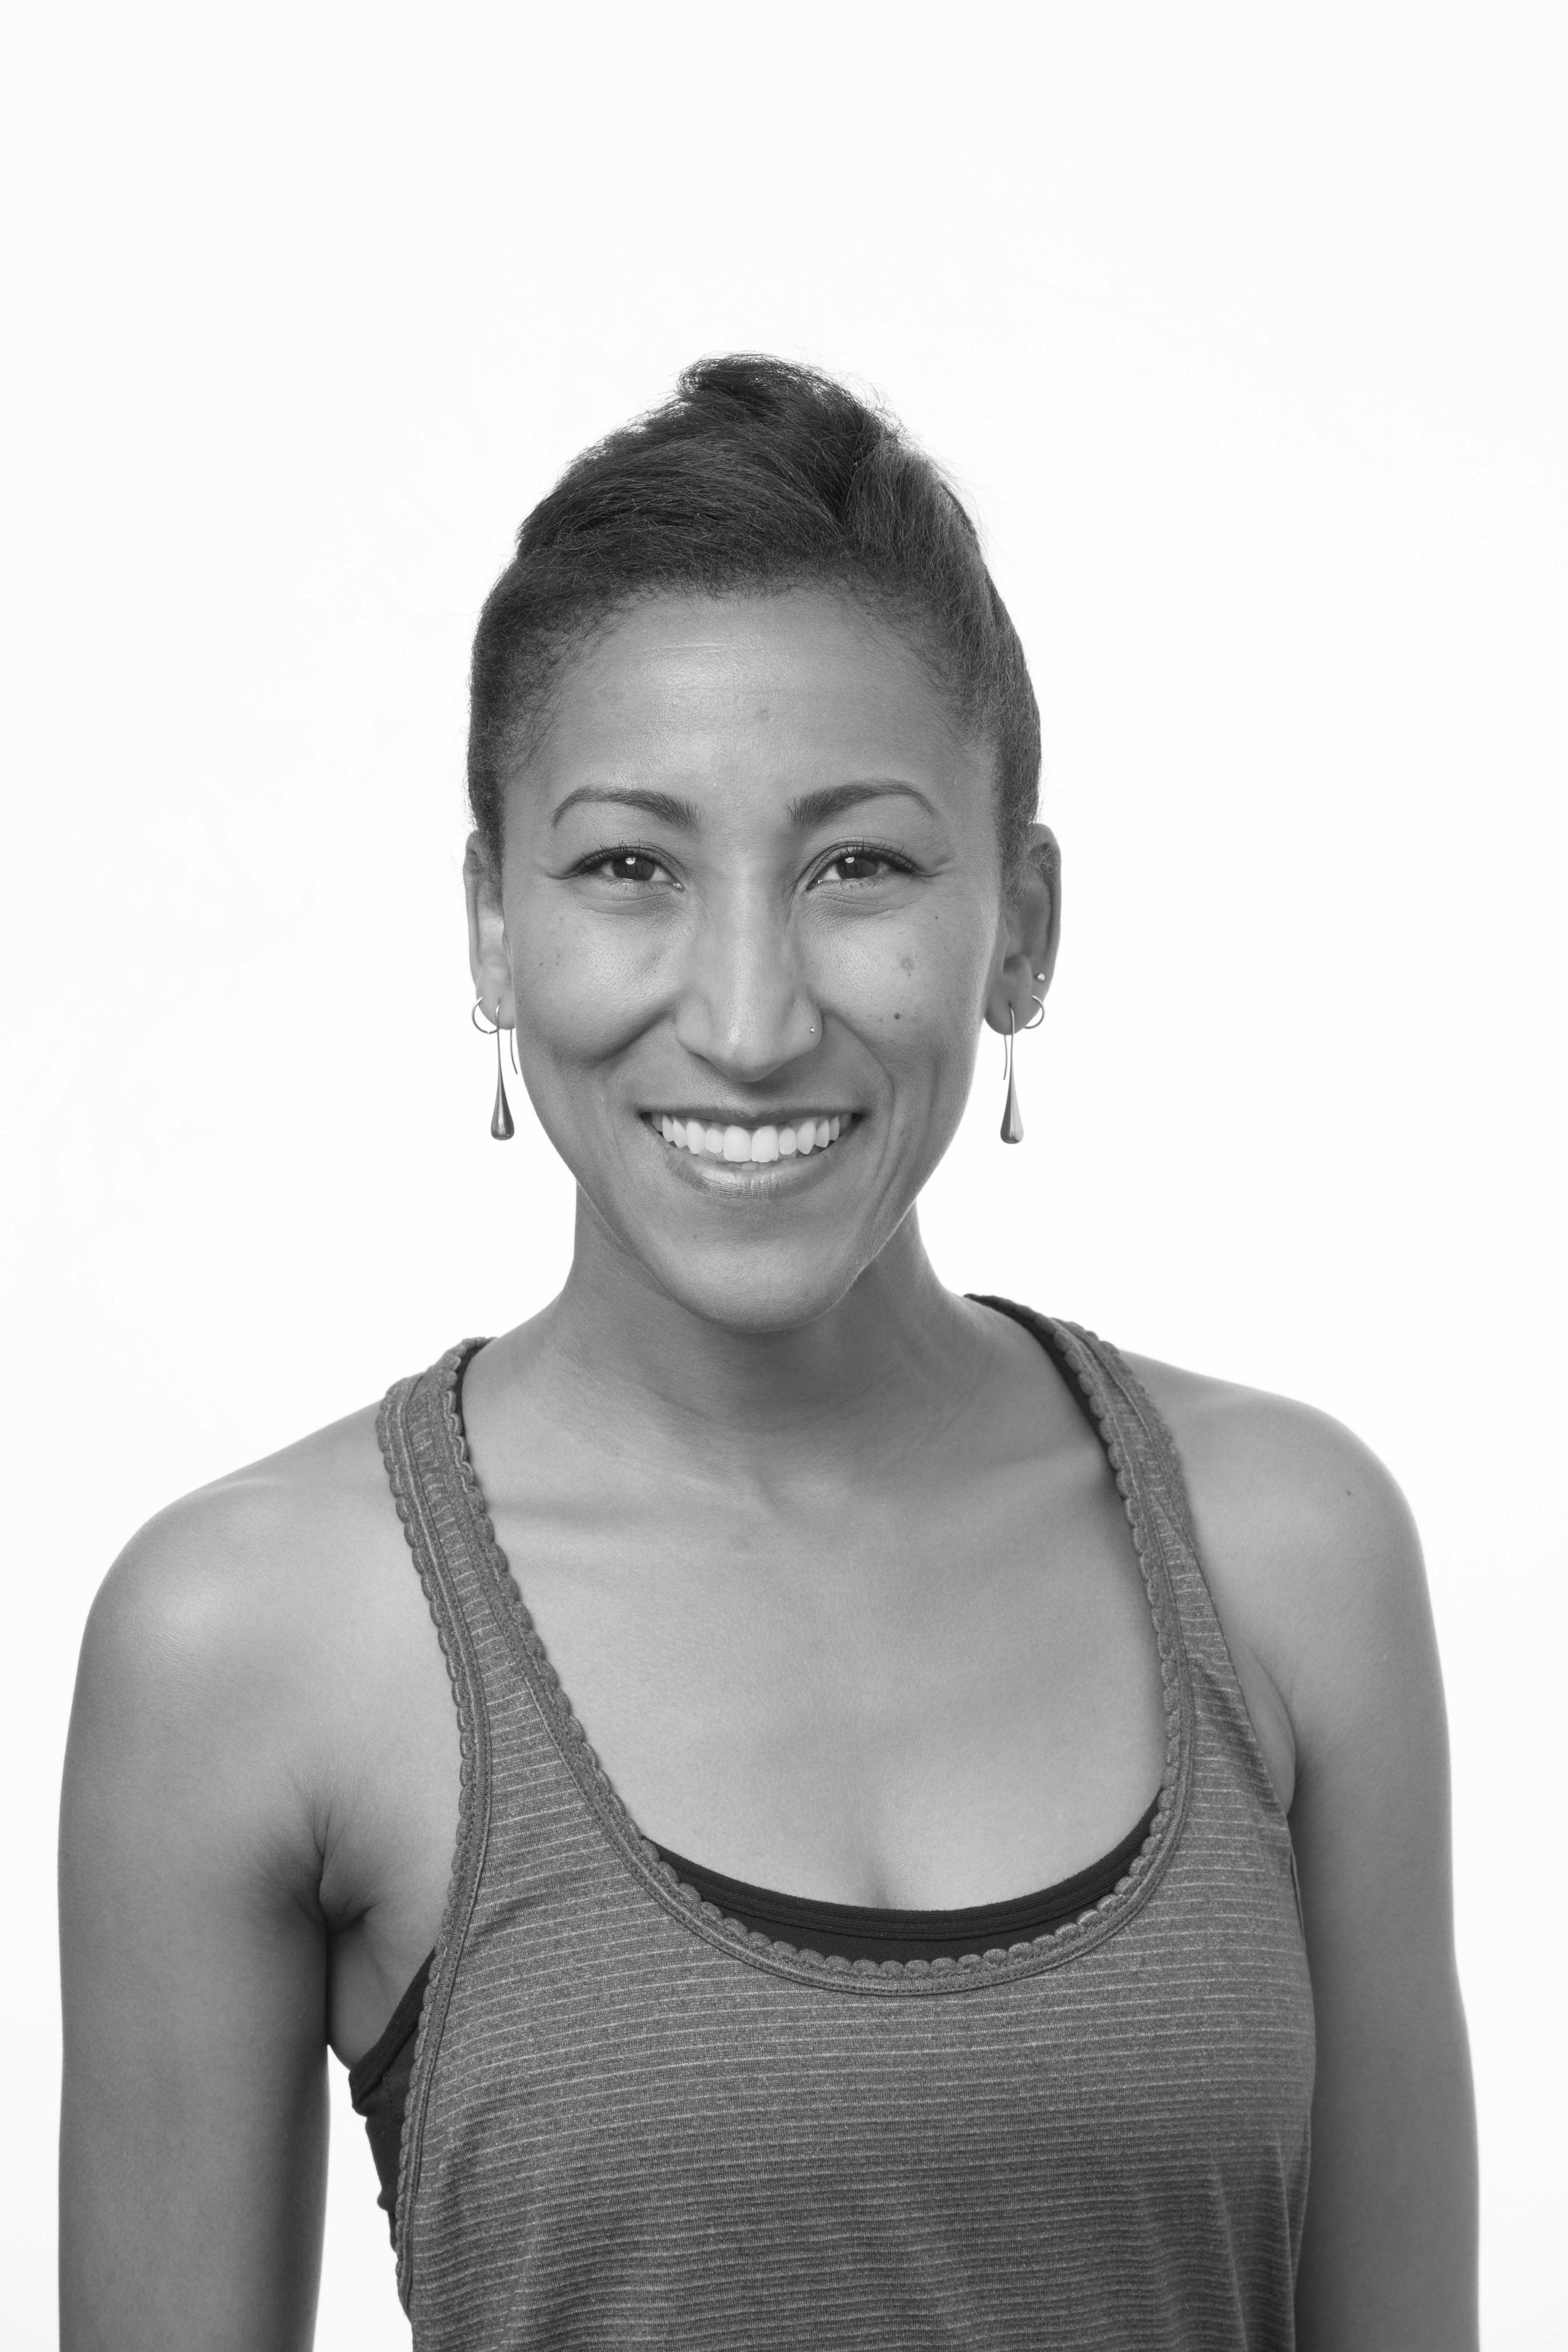 <b>Sequanna Manzenita</b><br>Faculty & Instructor